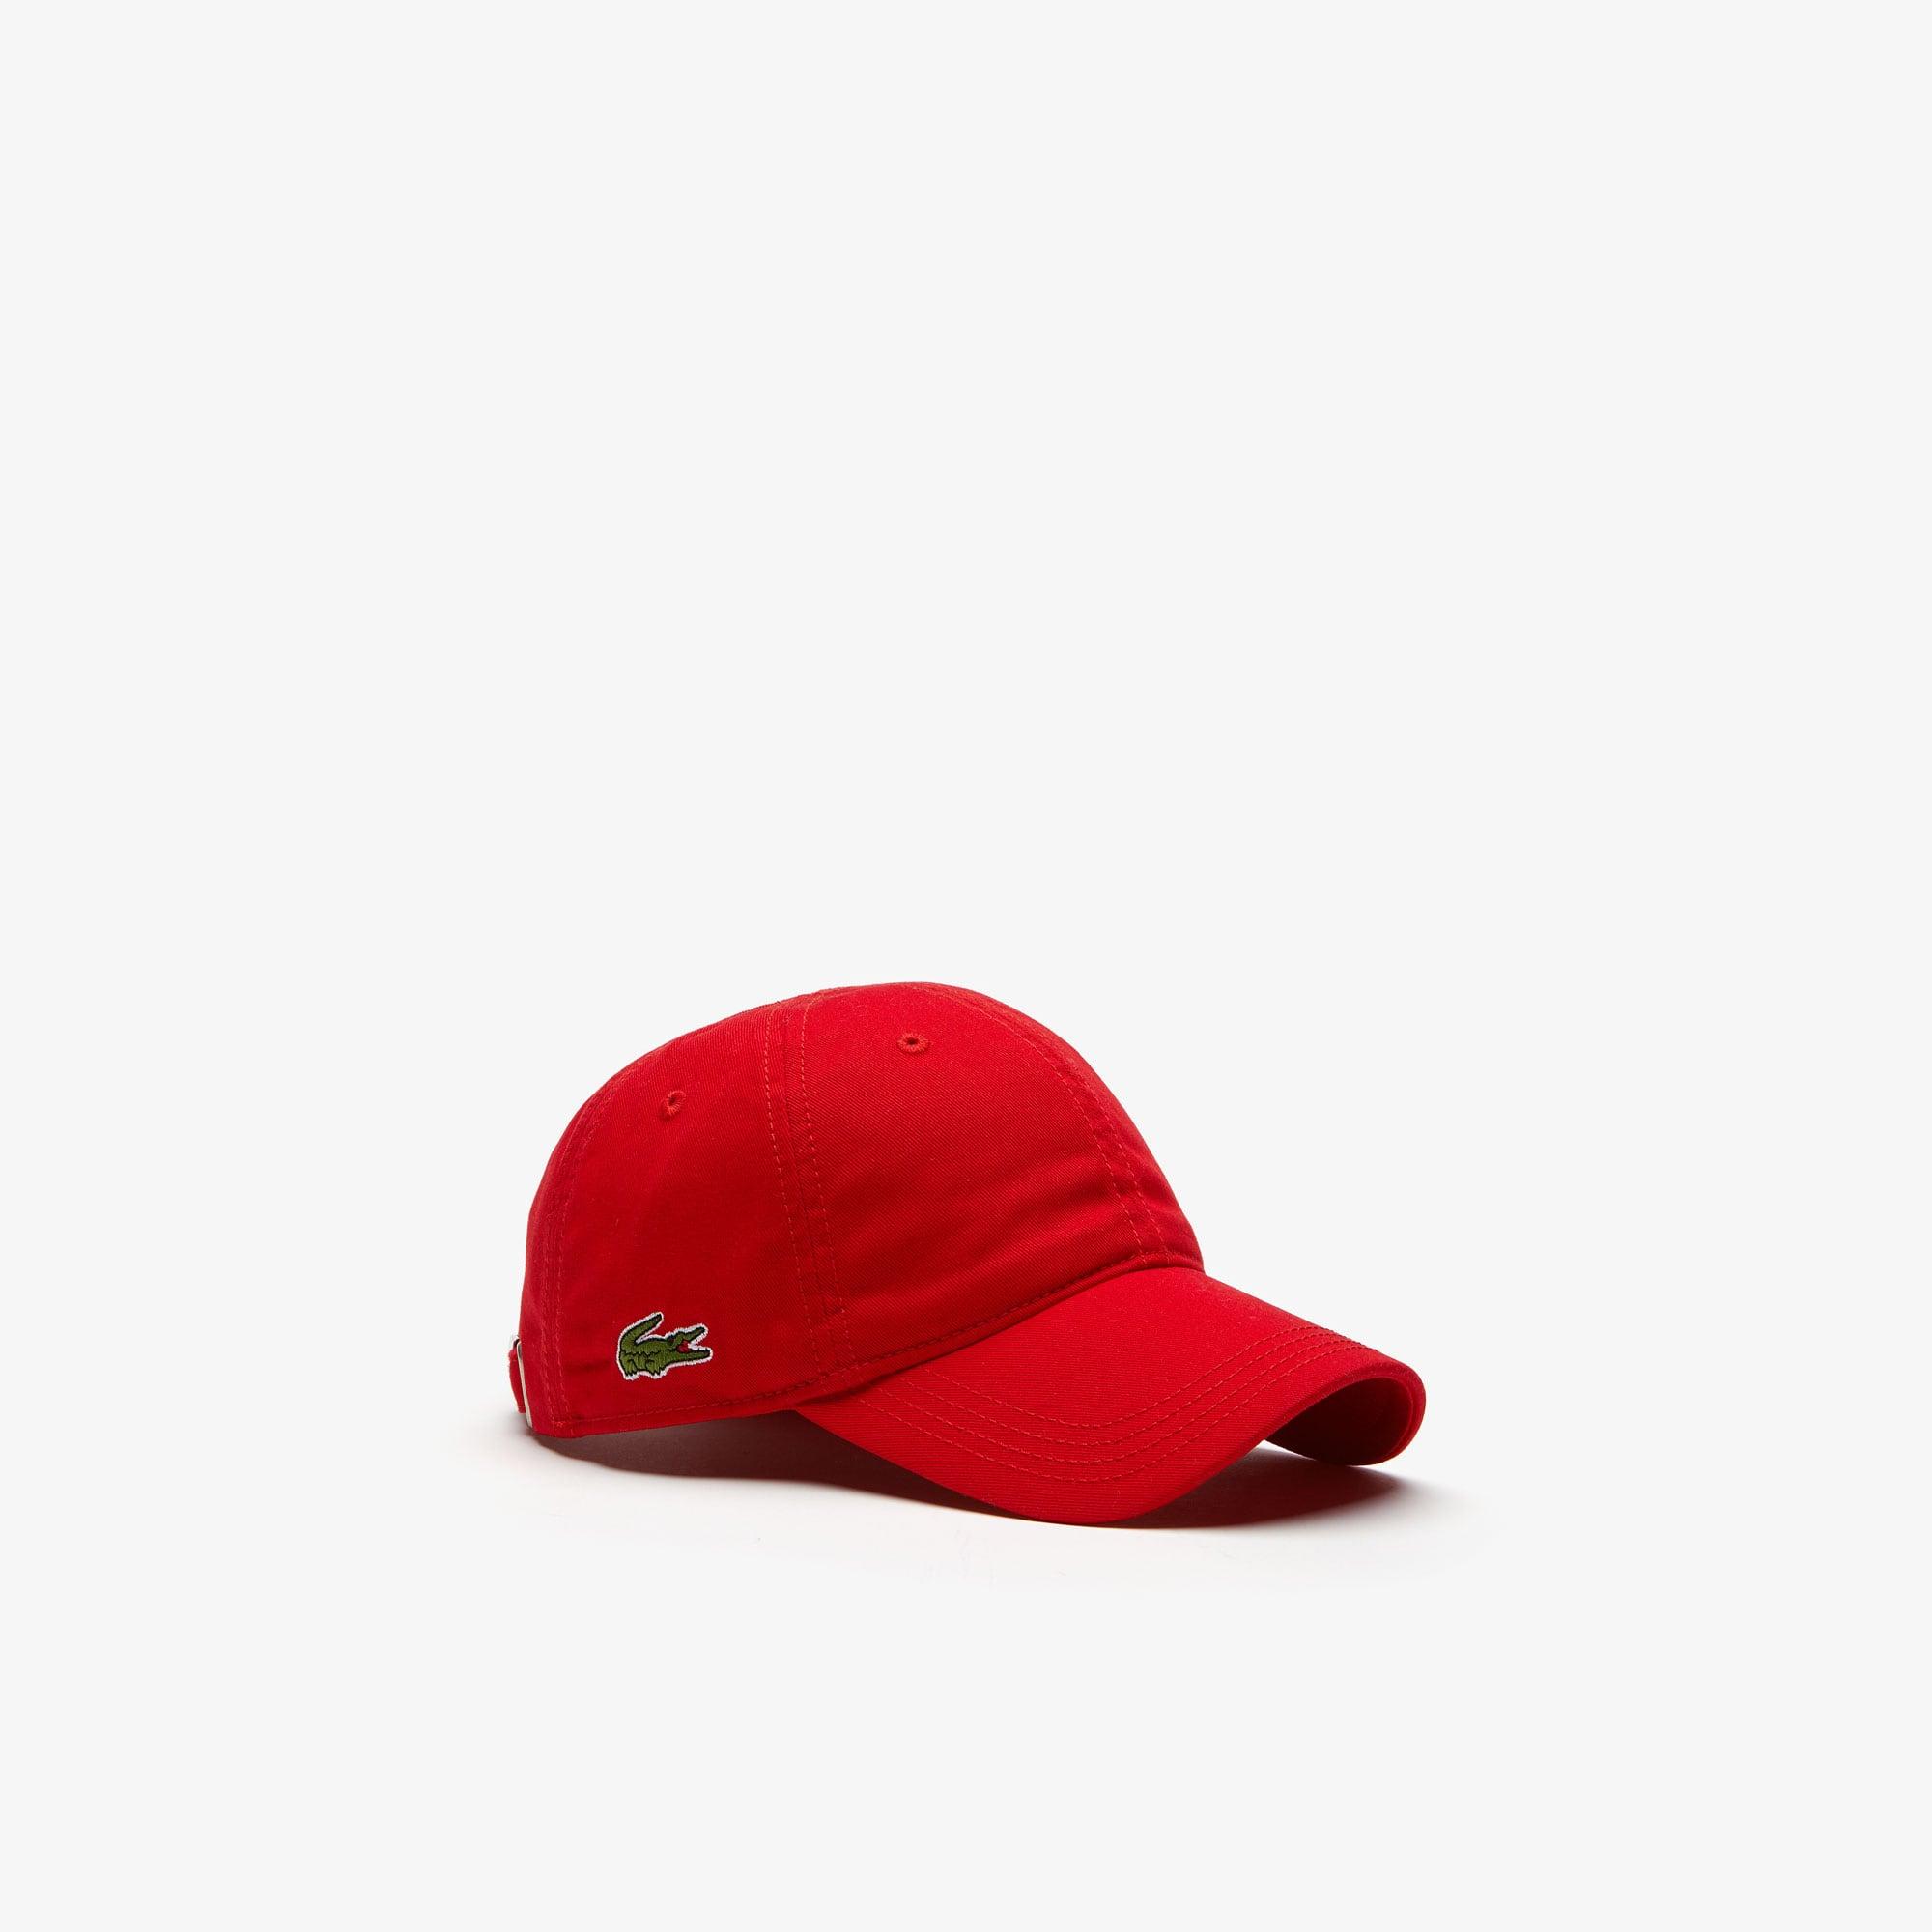 b5760cbc Gabardine cap